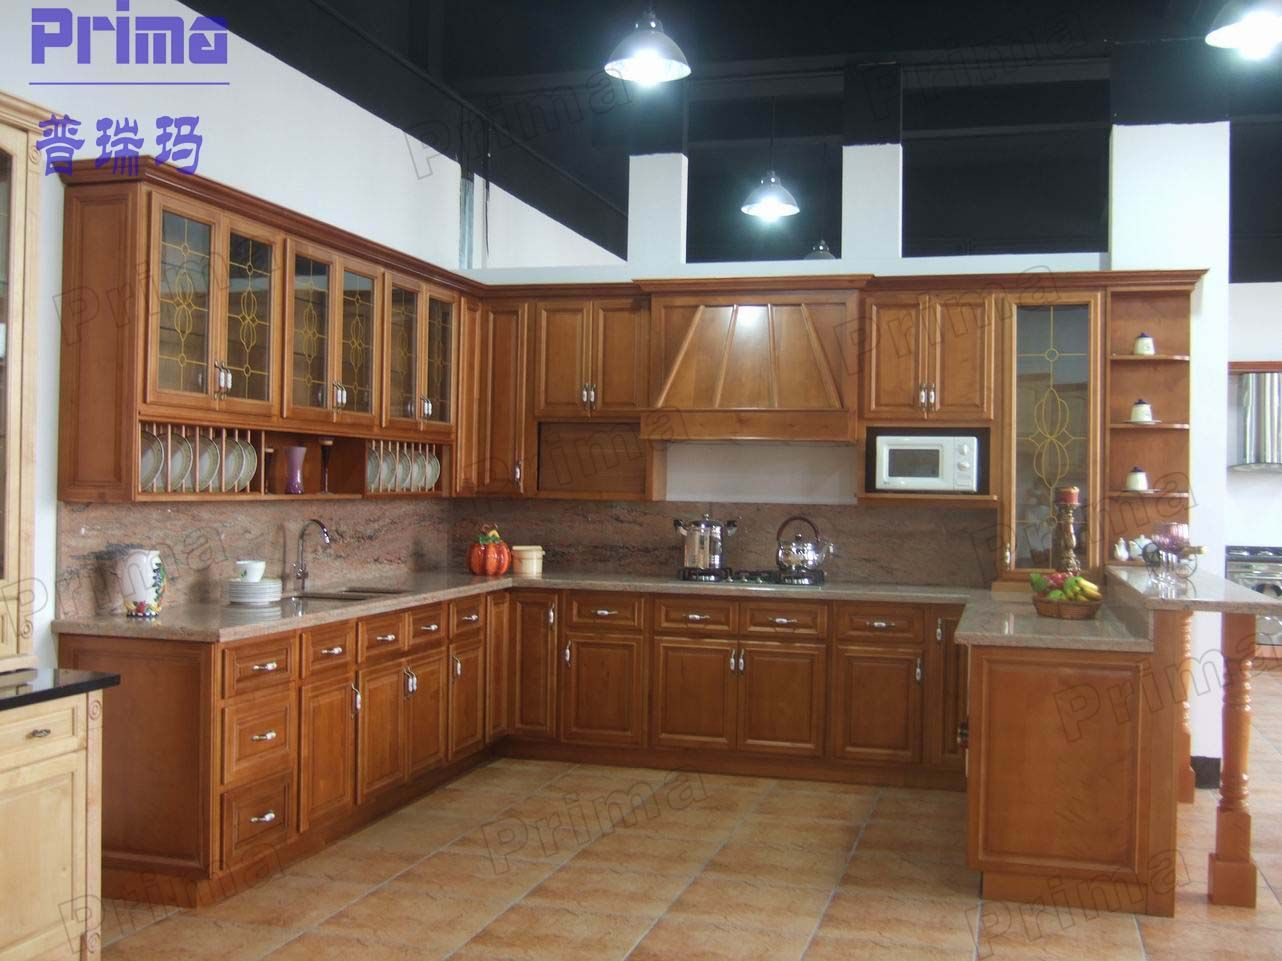 Redoutable Meuble De Cuisine 2015 Kitchen Furniture Design Modern Kitchen Cabinets Kitchen Cabinet Design